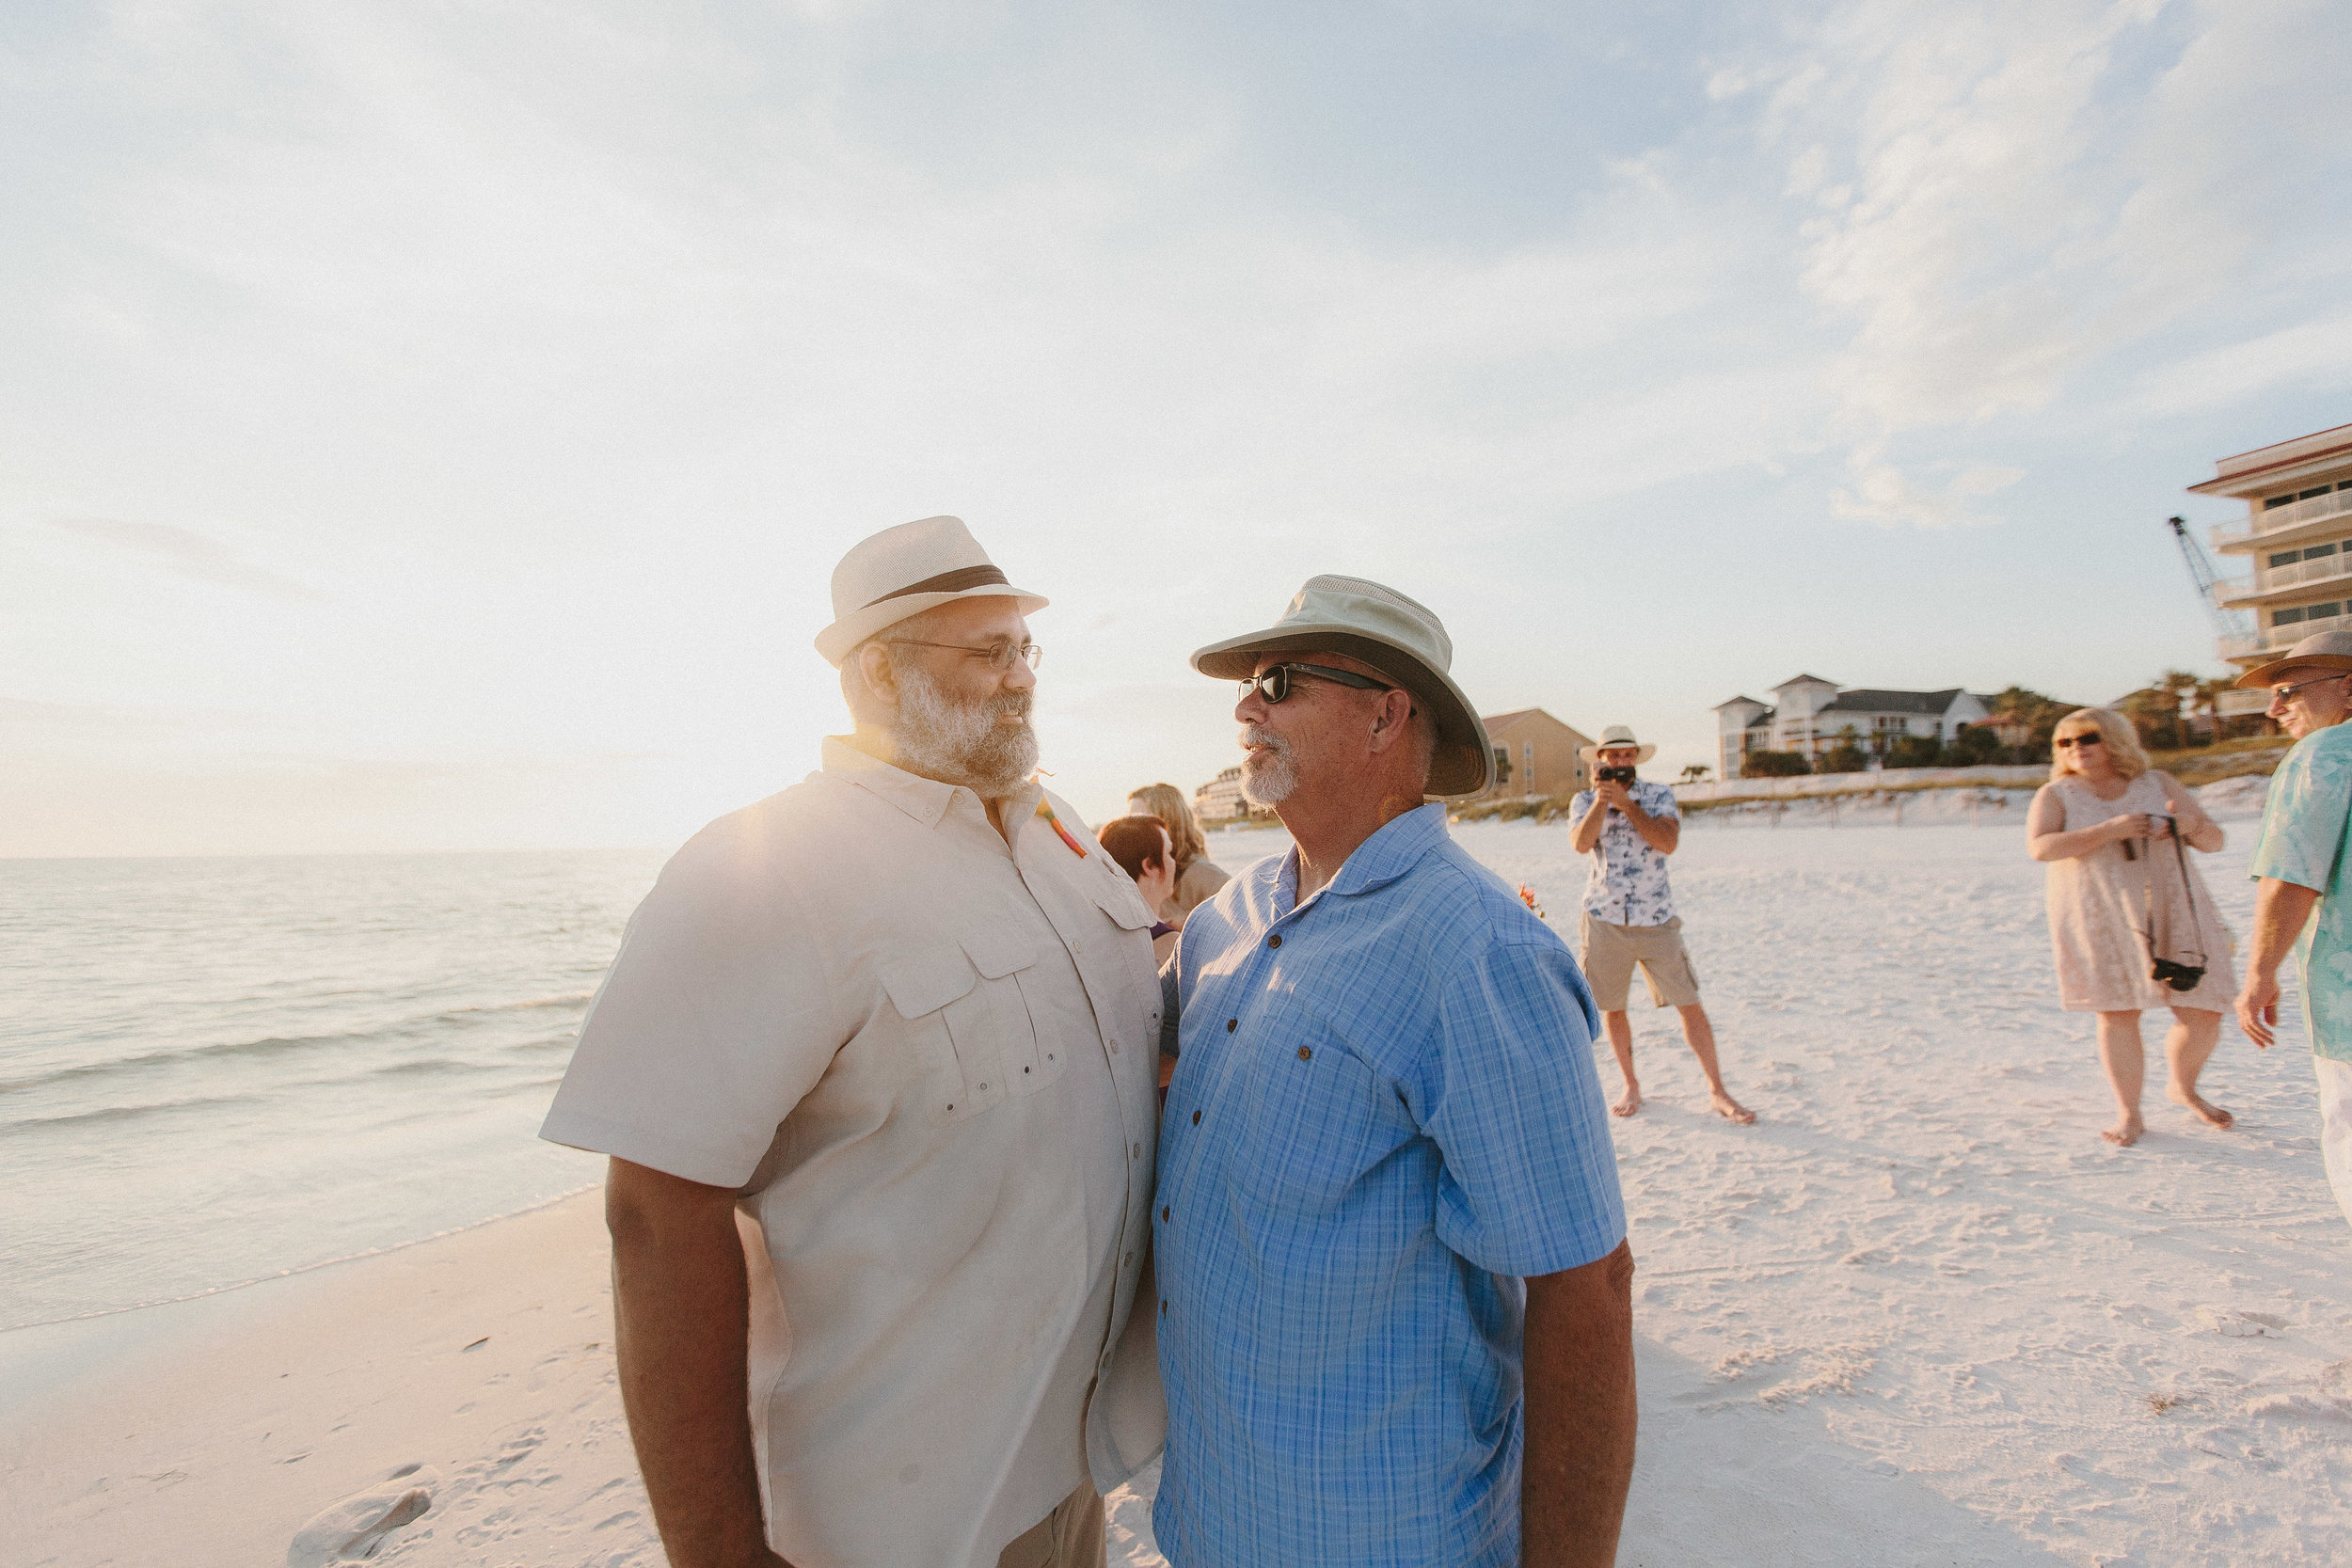 destin_sunset_beach_elopement_intimate_wedding_photographer_florida_documentary_1243.jpg